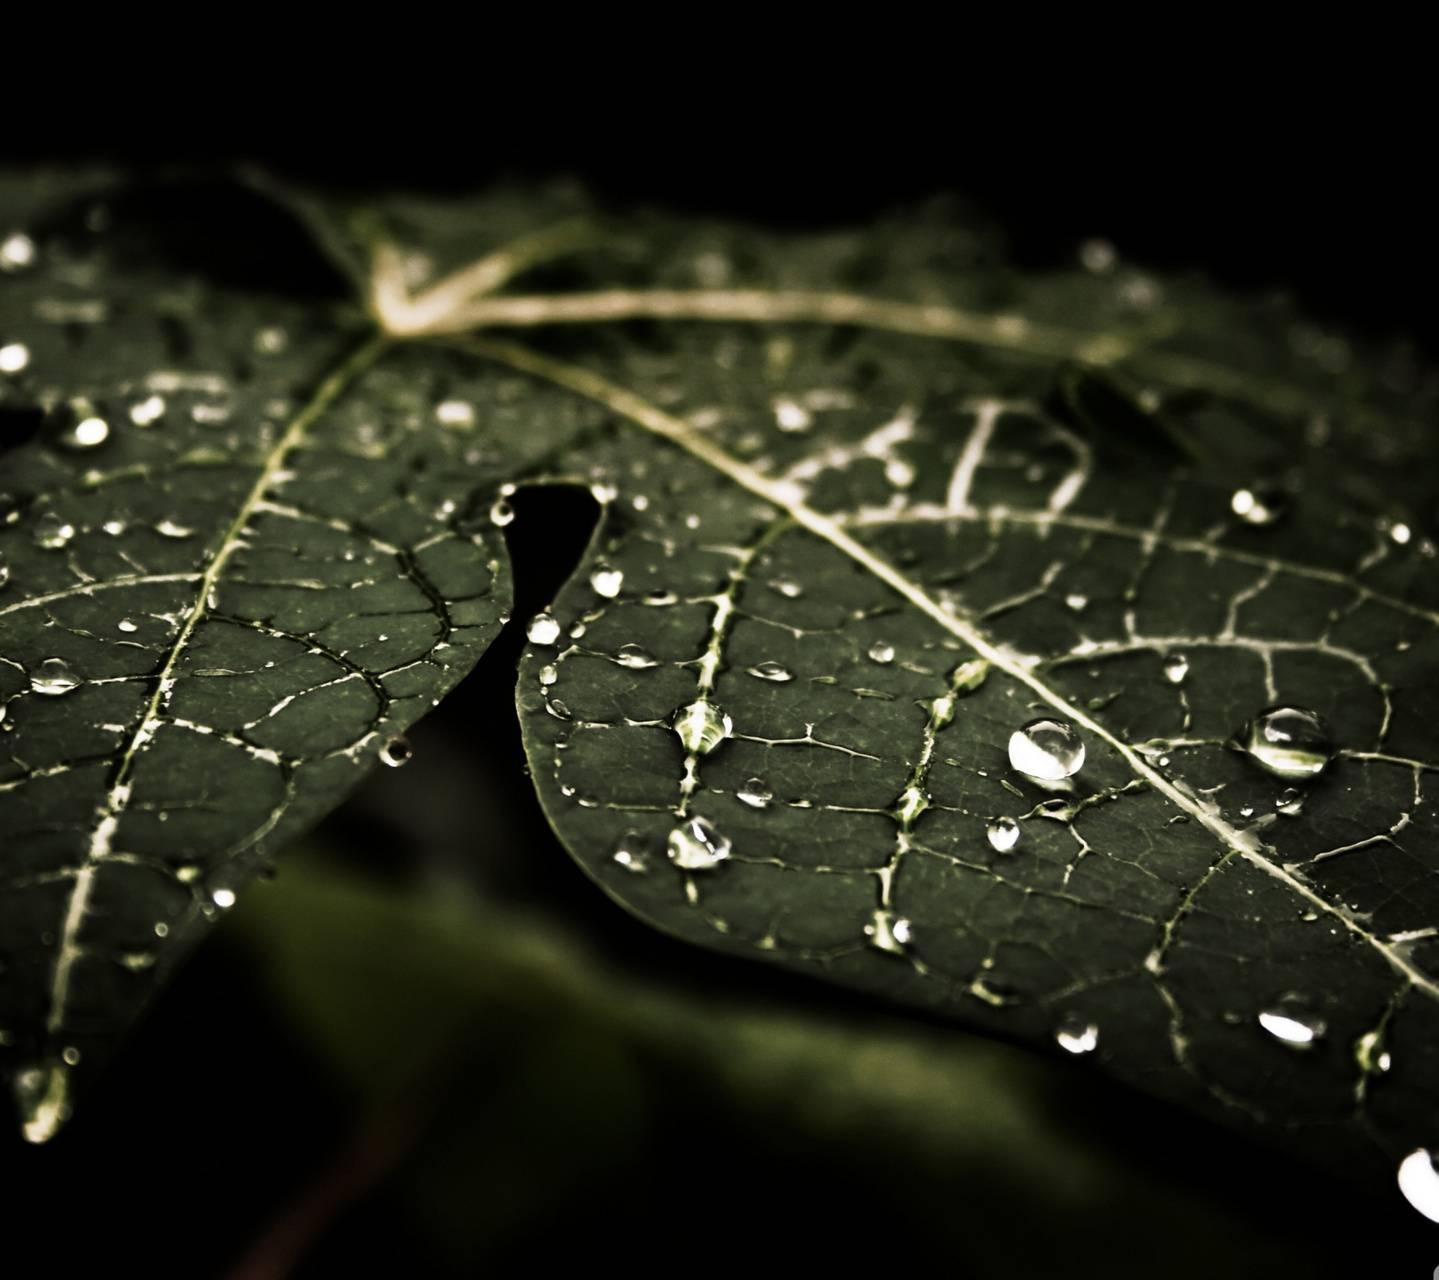 Leafy Droplets